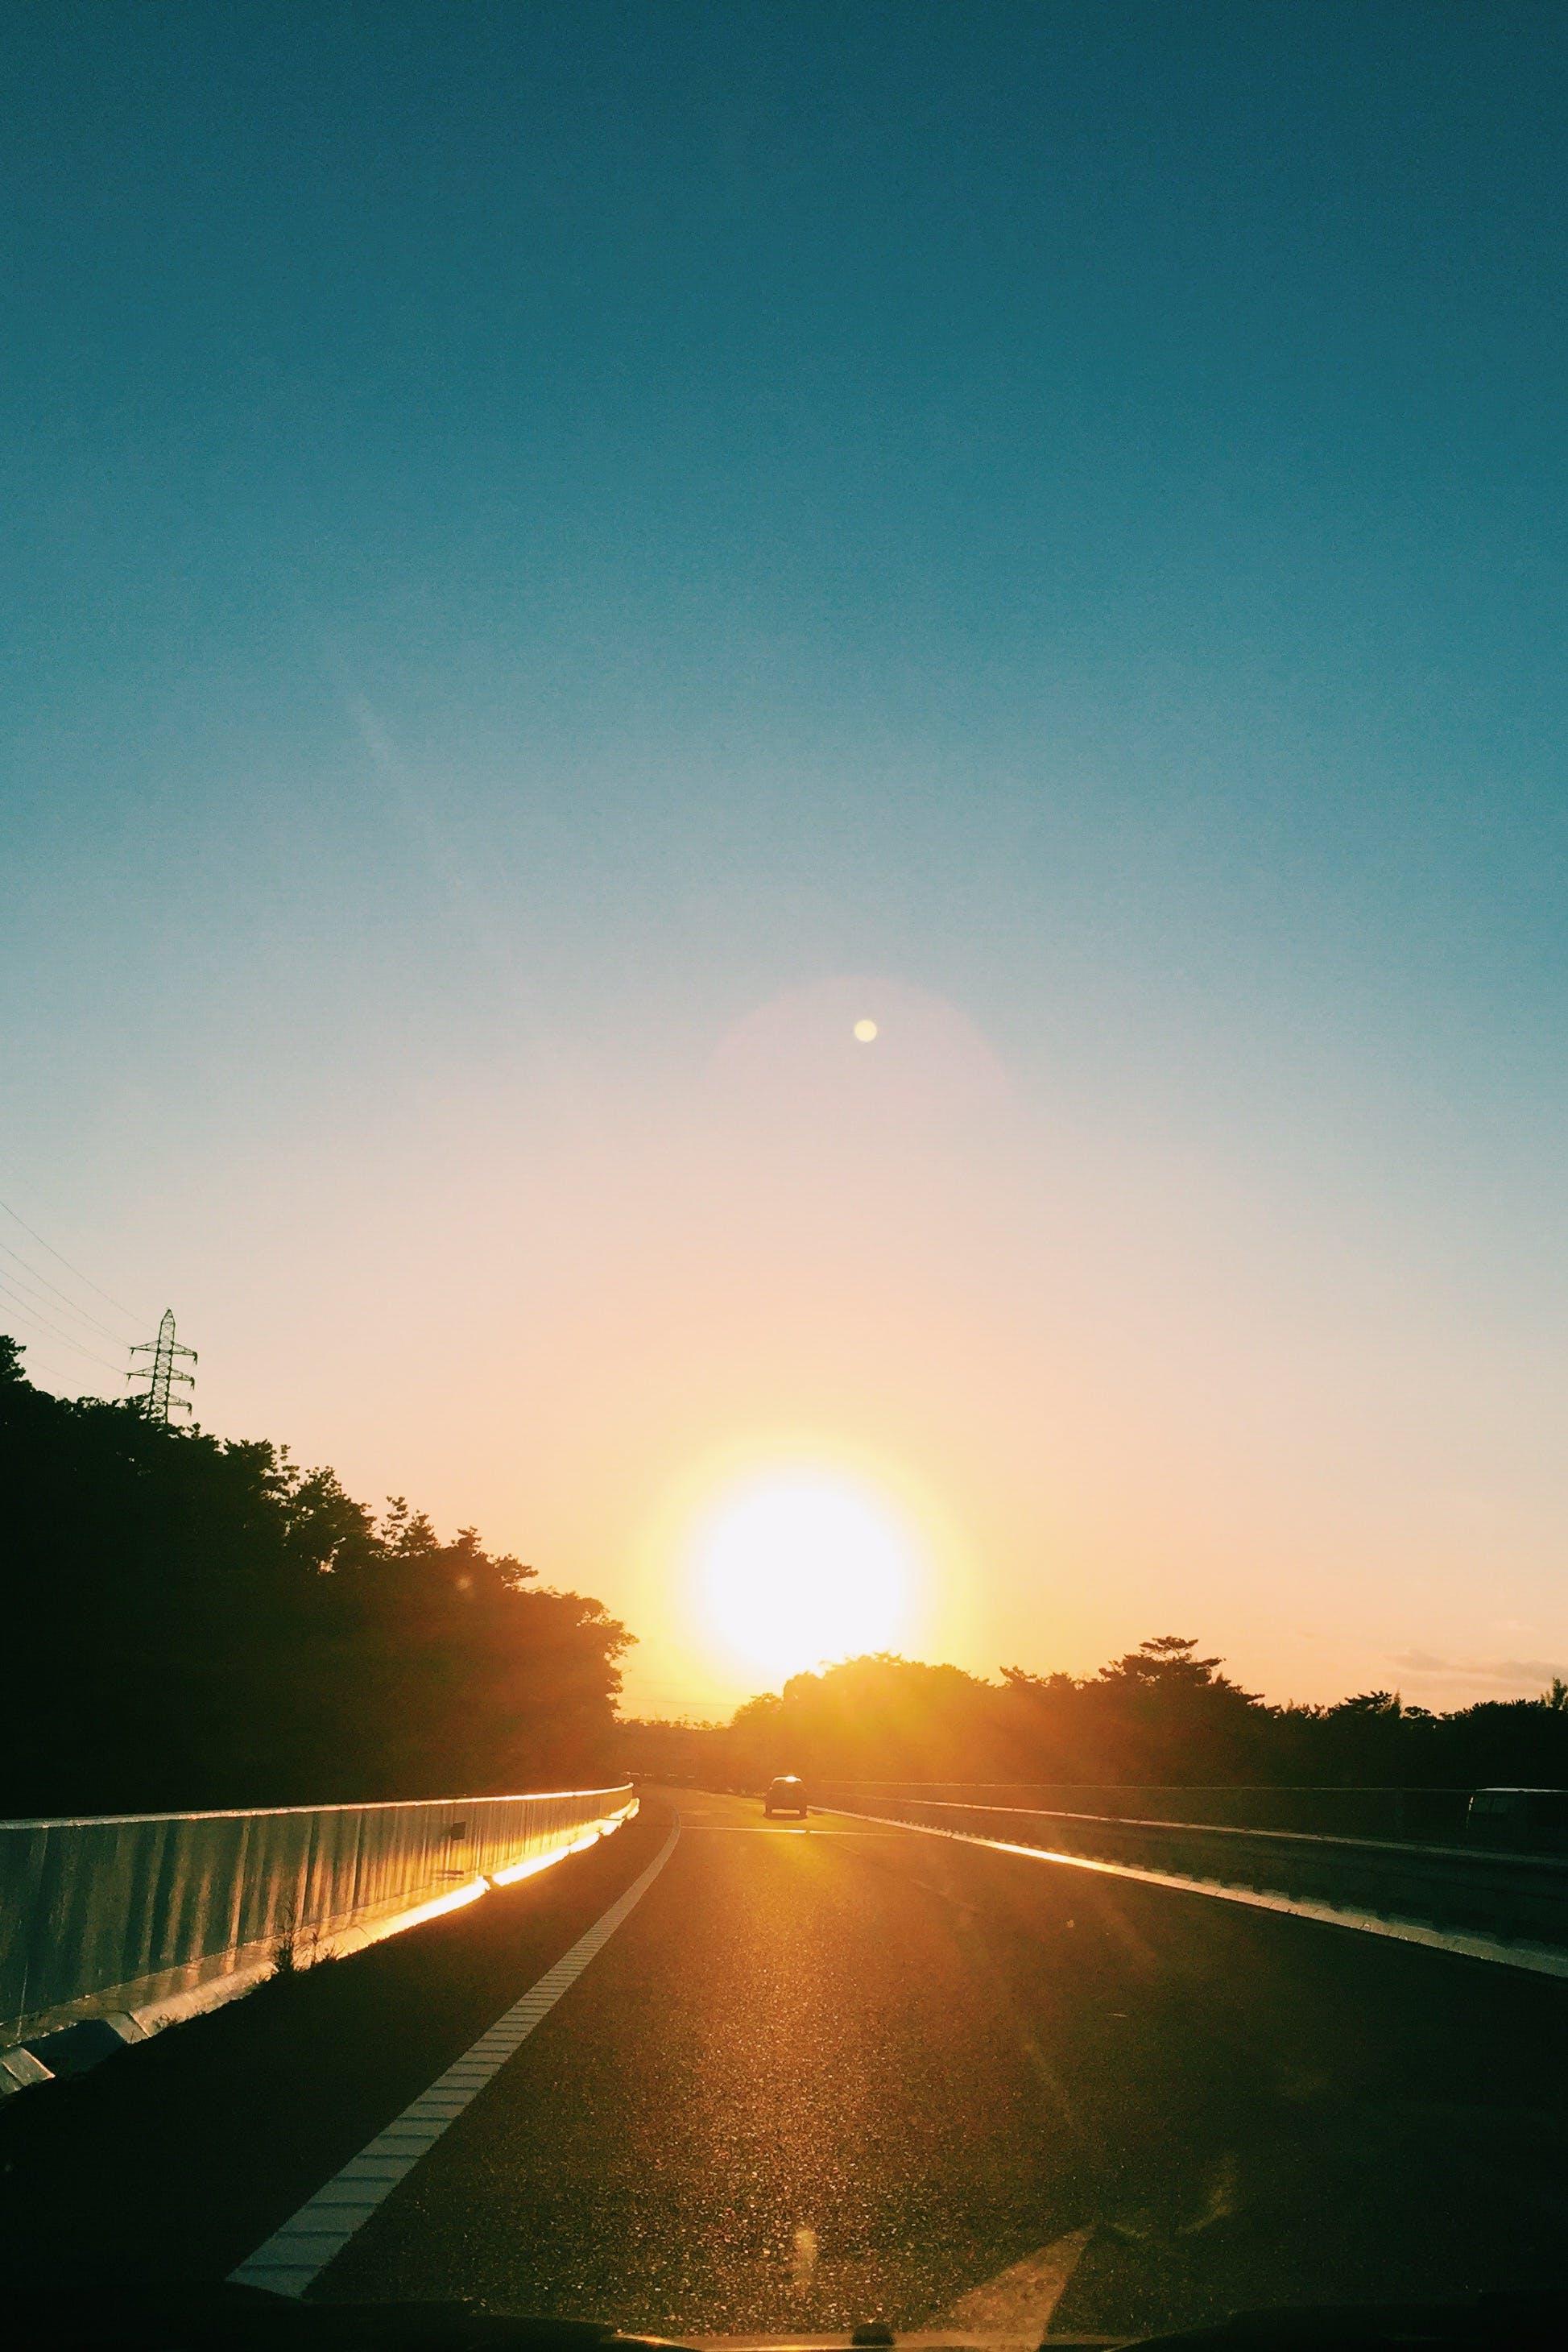 Free stock photo of expressway, golden sunset, road, street